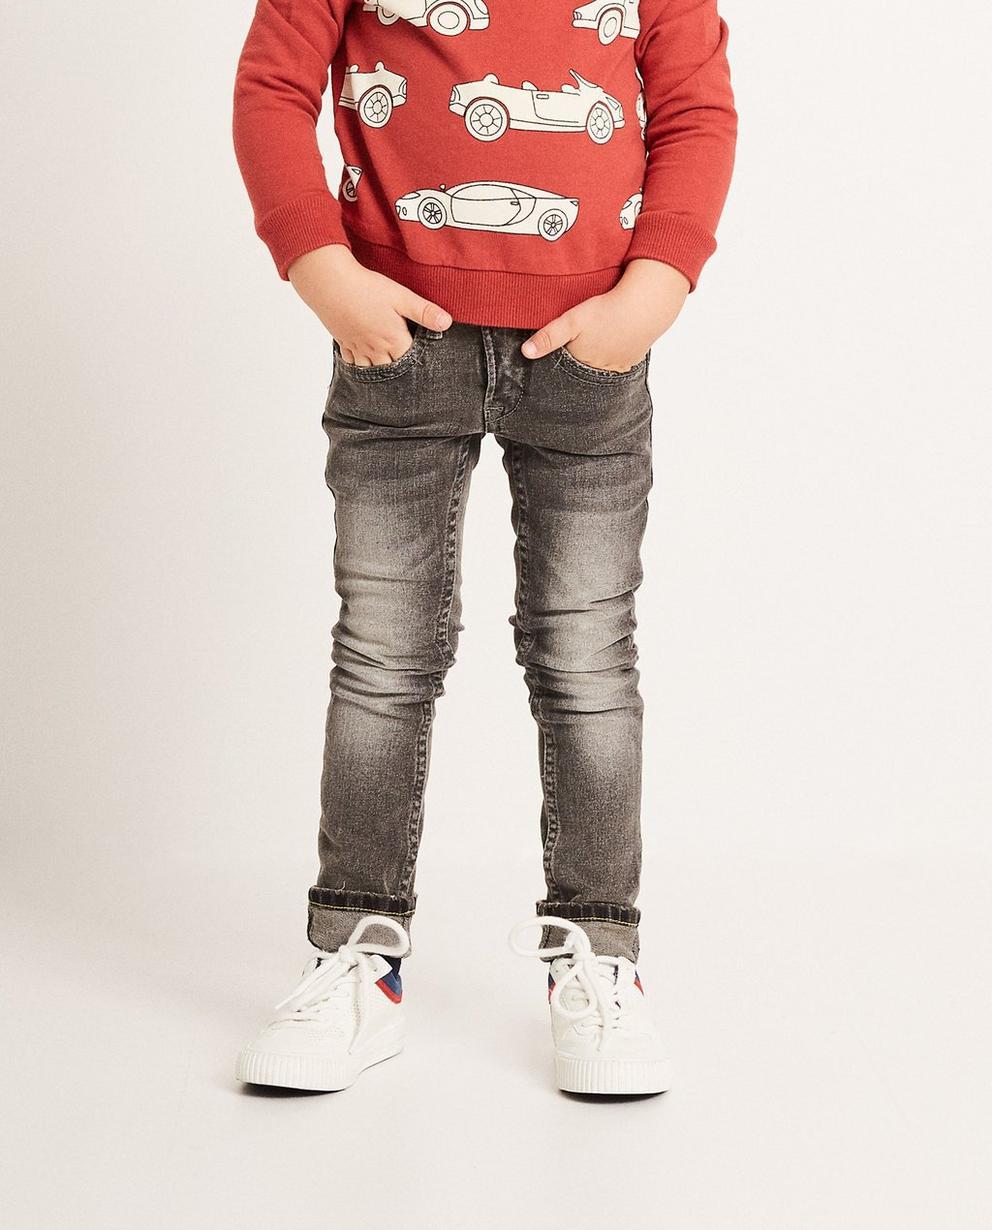 Jeans - Grau -